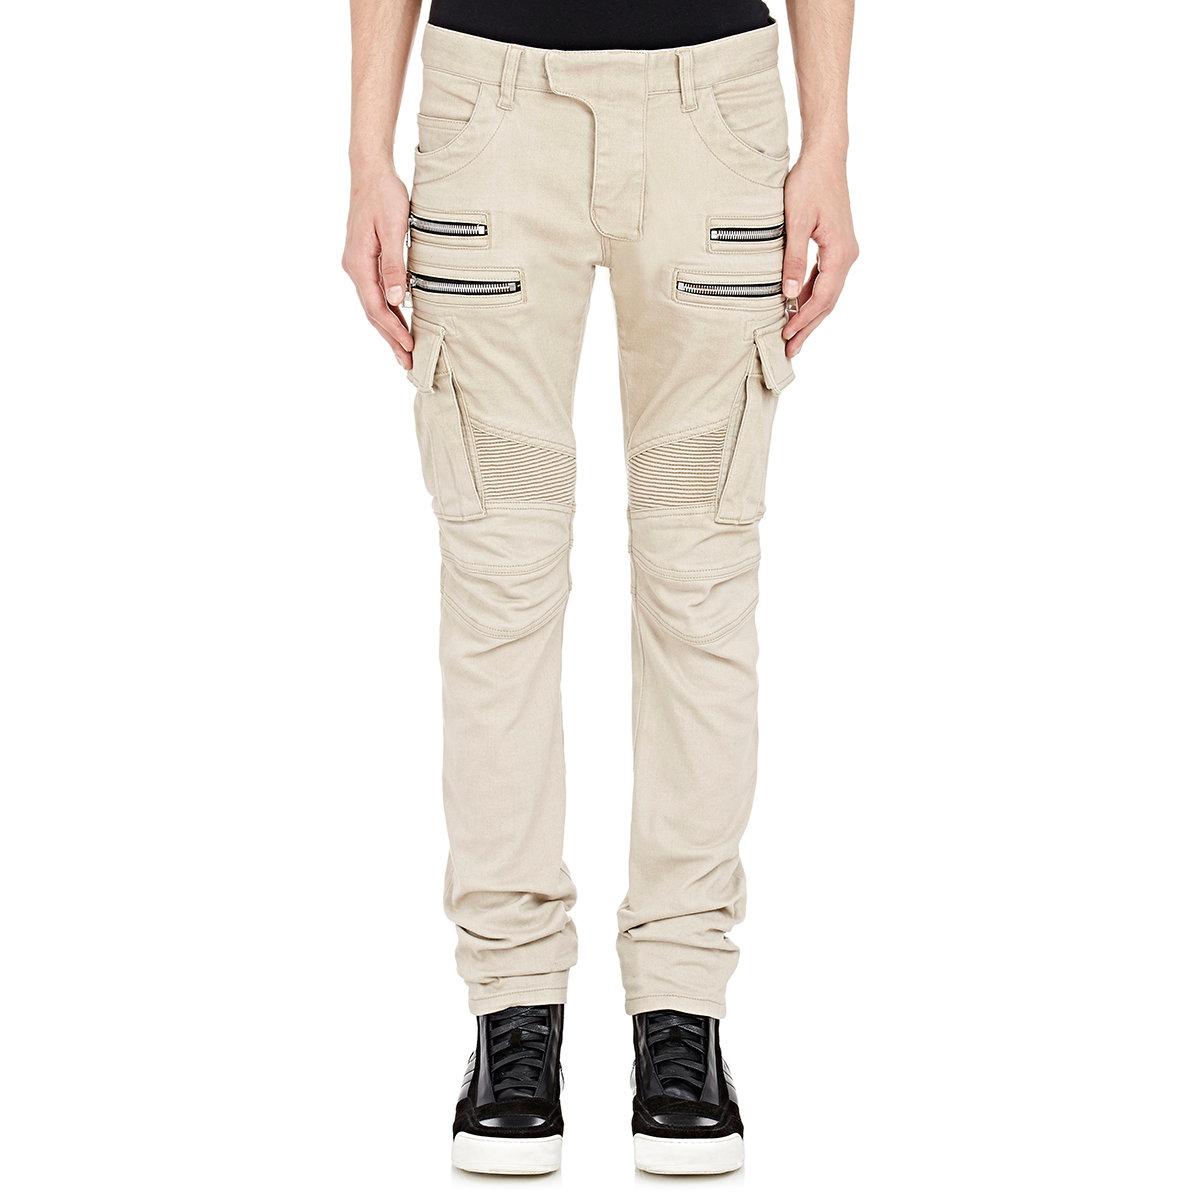 f3babfc0 Balmain Men's Moto Cargo Jeans in Natural for Men - Lyst